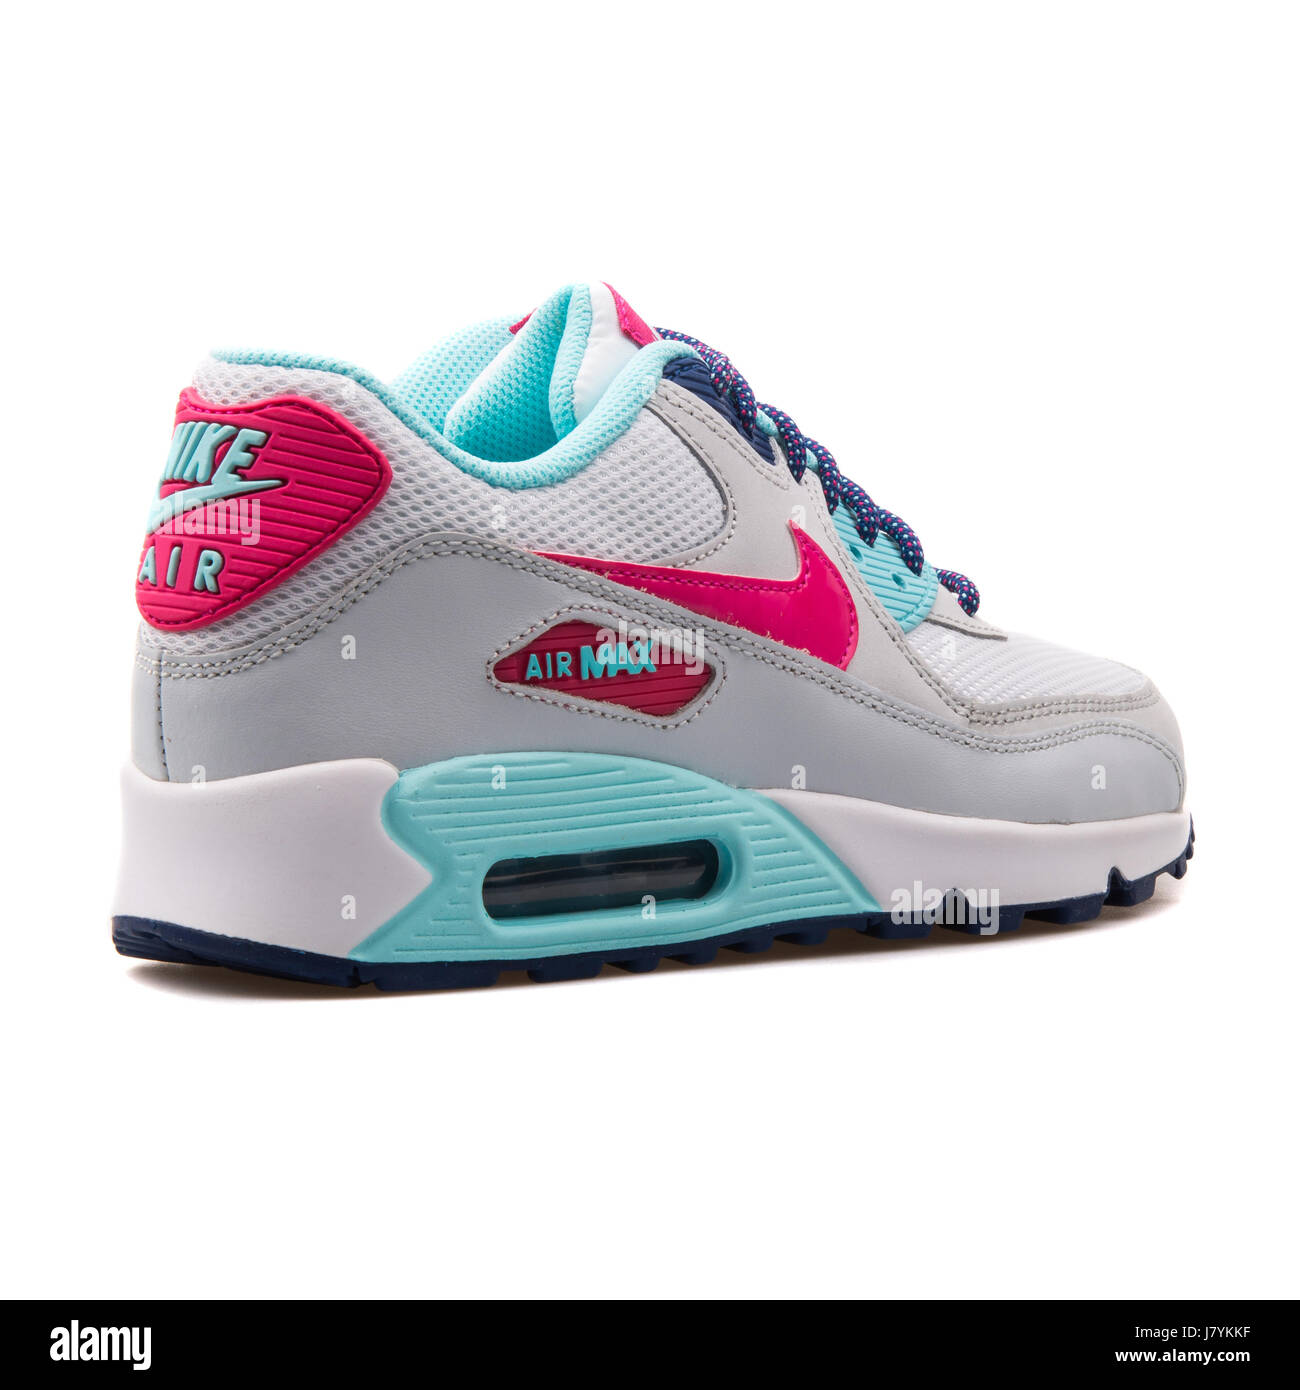 check out fb864 083ef Nike Air Max 90 Mesh (GS) Youth White Vivid Pink Copa Platinum - 724855-102